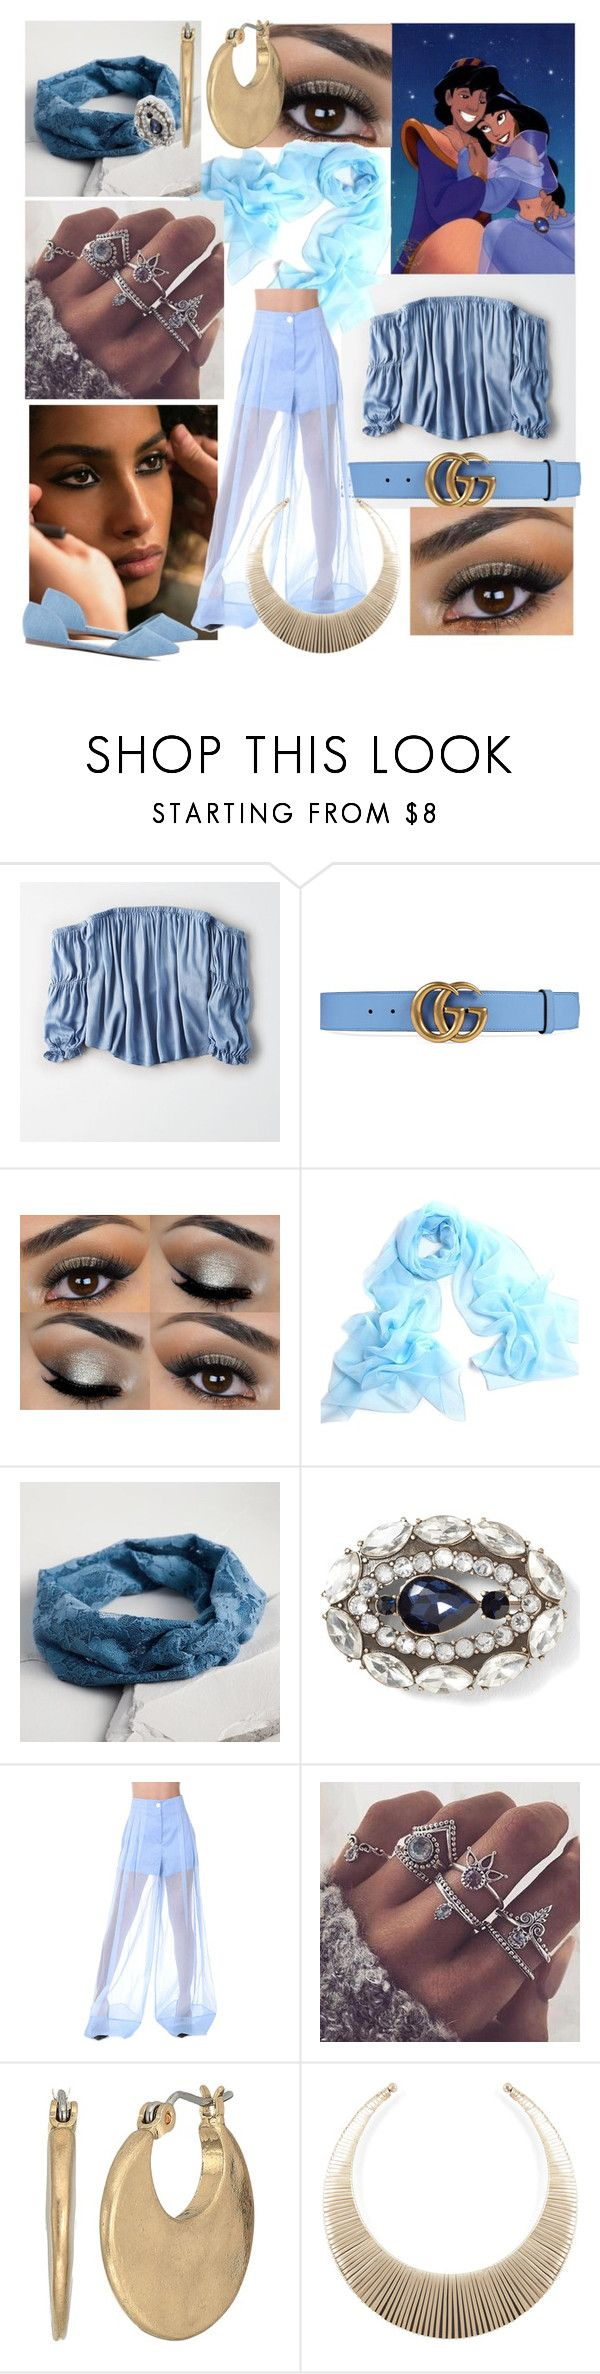 """Princess Jasmin #fashion #Disney #Jasmin #princessJasmin"" by margosedih ❤ liked on Polyvore featuring American Eagle Outfitters, Gucci, Cost Plus World Market, Emilio Pucci and The Sak"